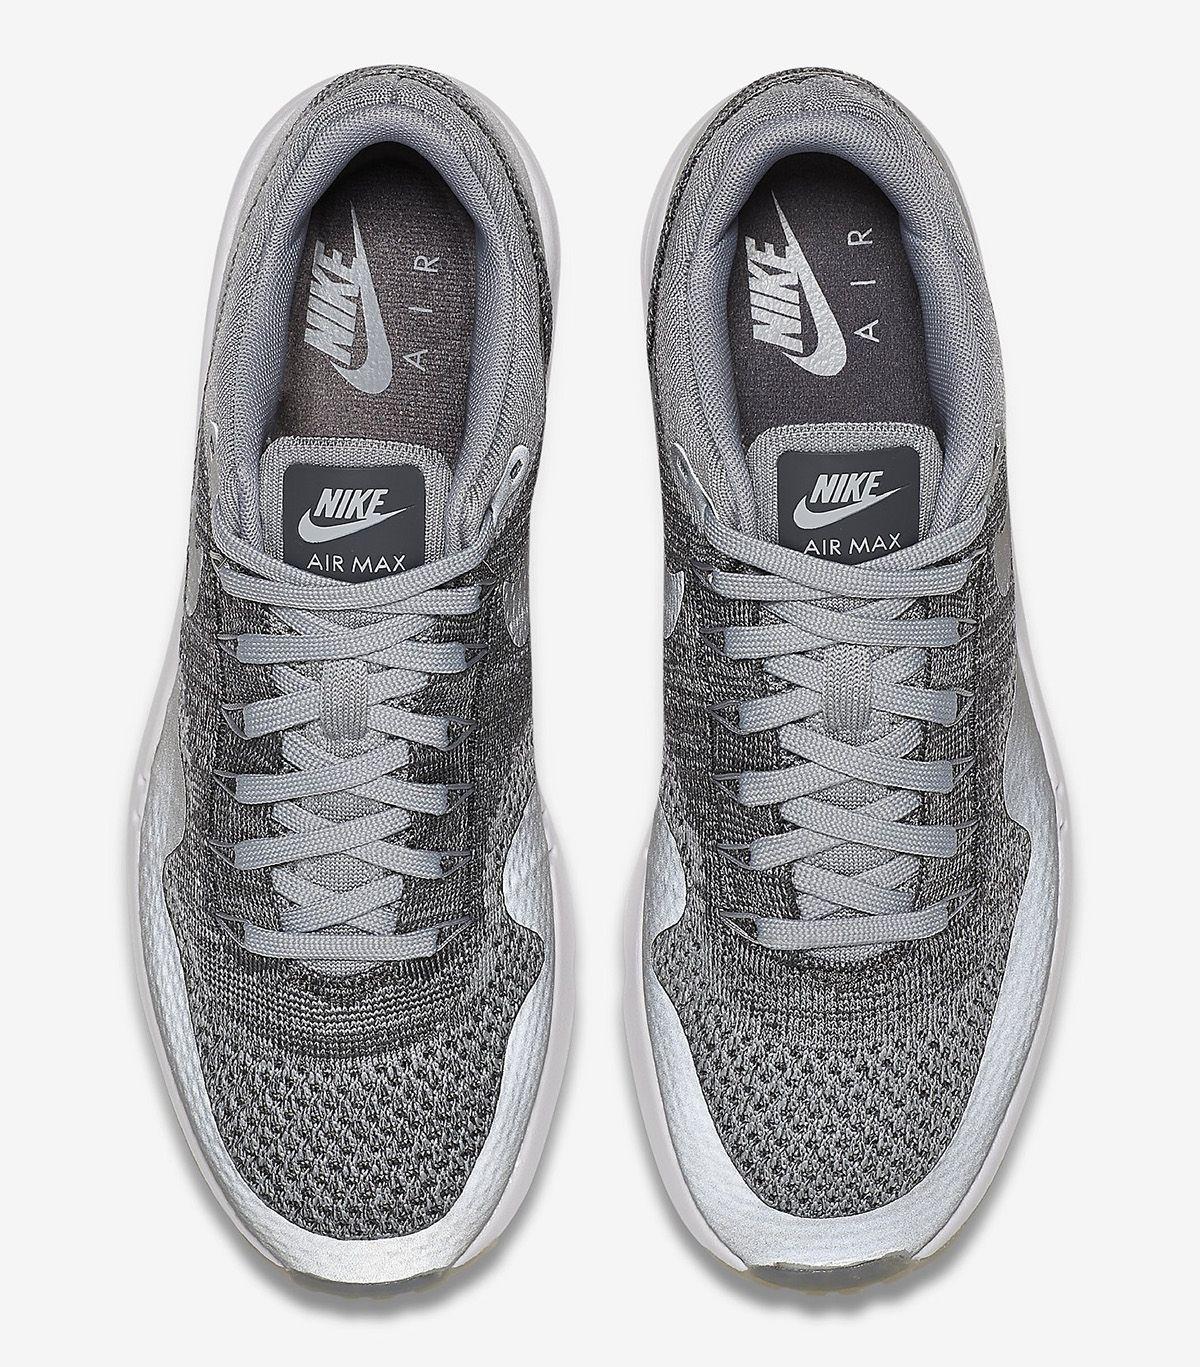 22952a18b4e Nike Air Max 1 Ultra Flyknit